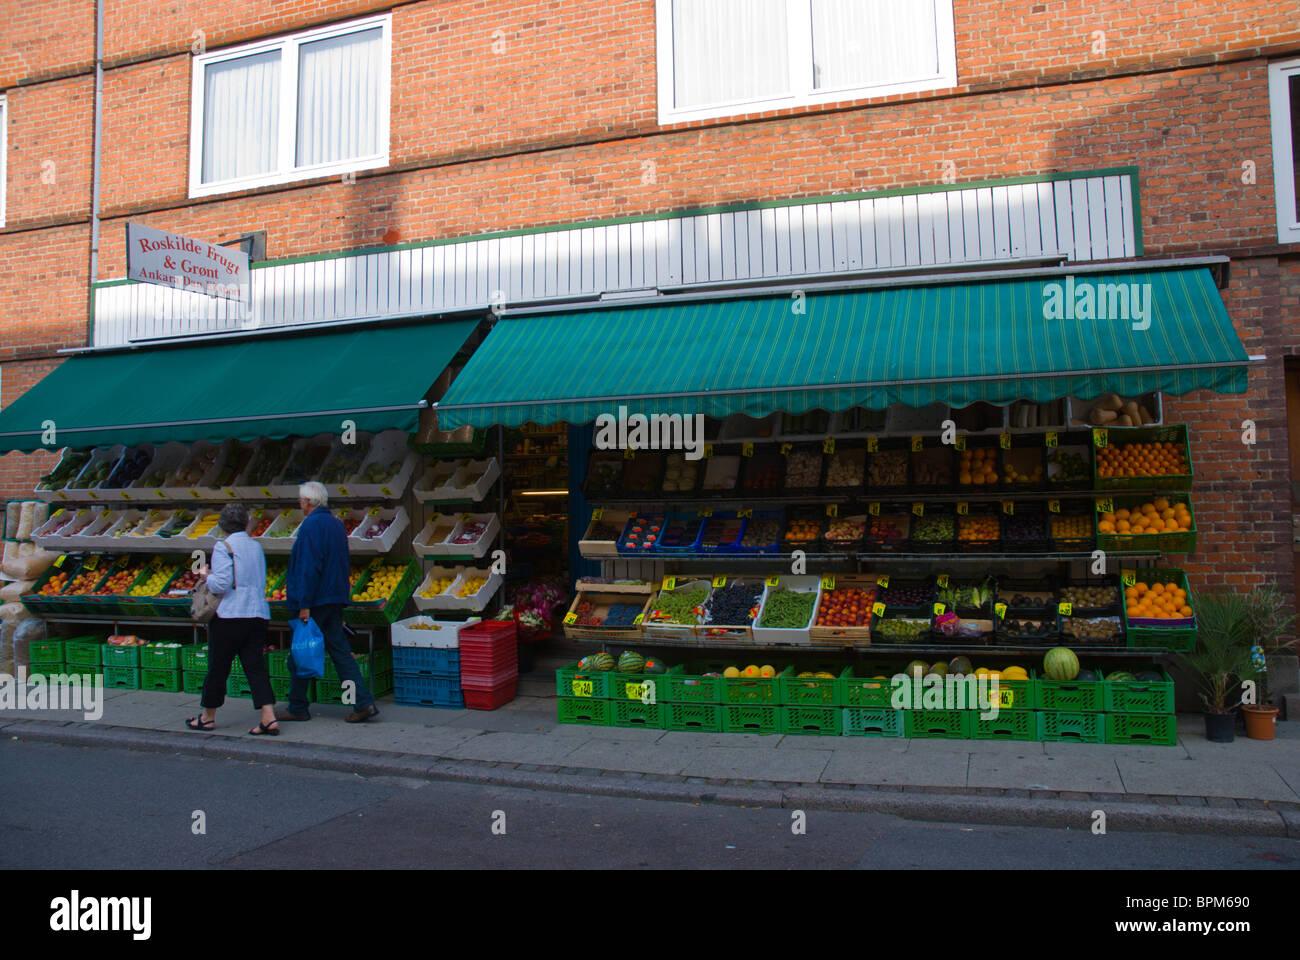 Greengrocer and supermarket exterior central Roskilde Denmark Europe - Stock Image